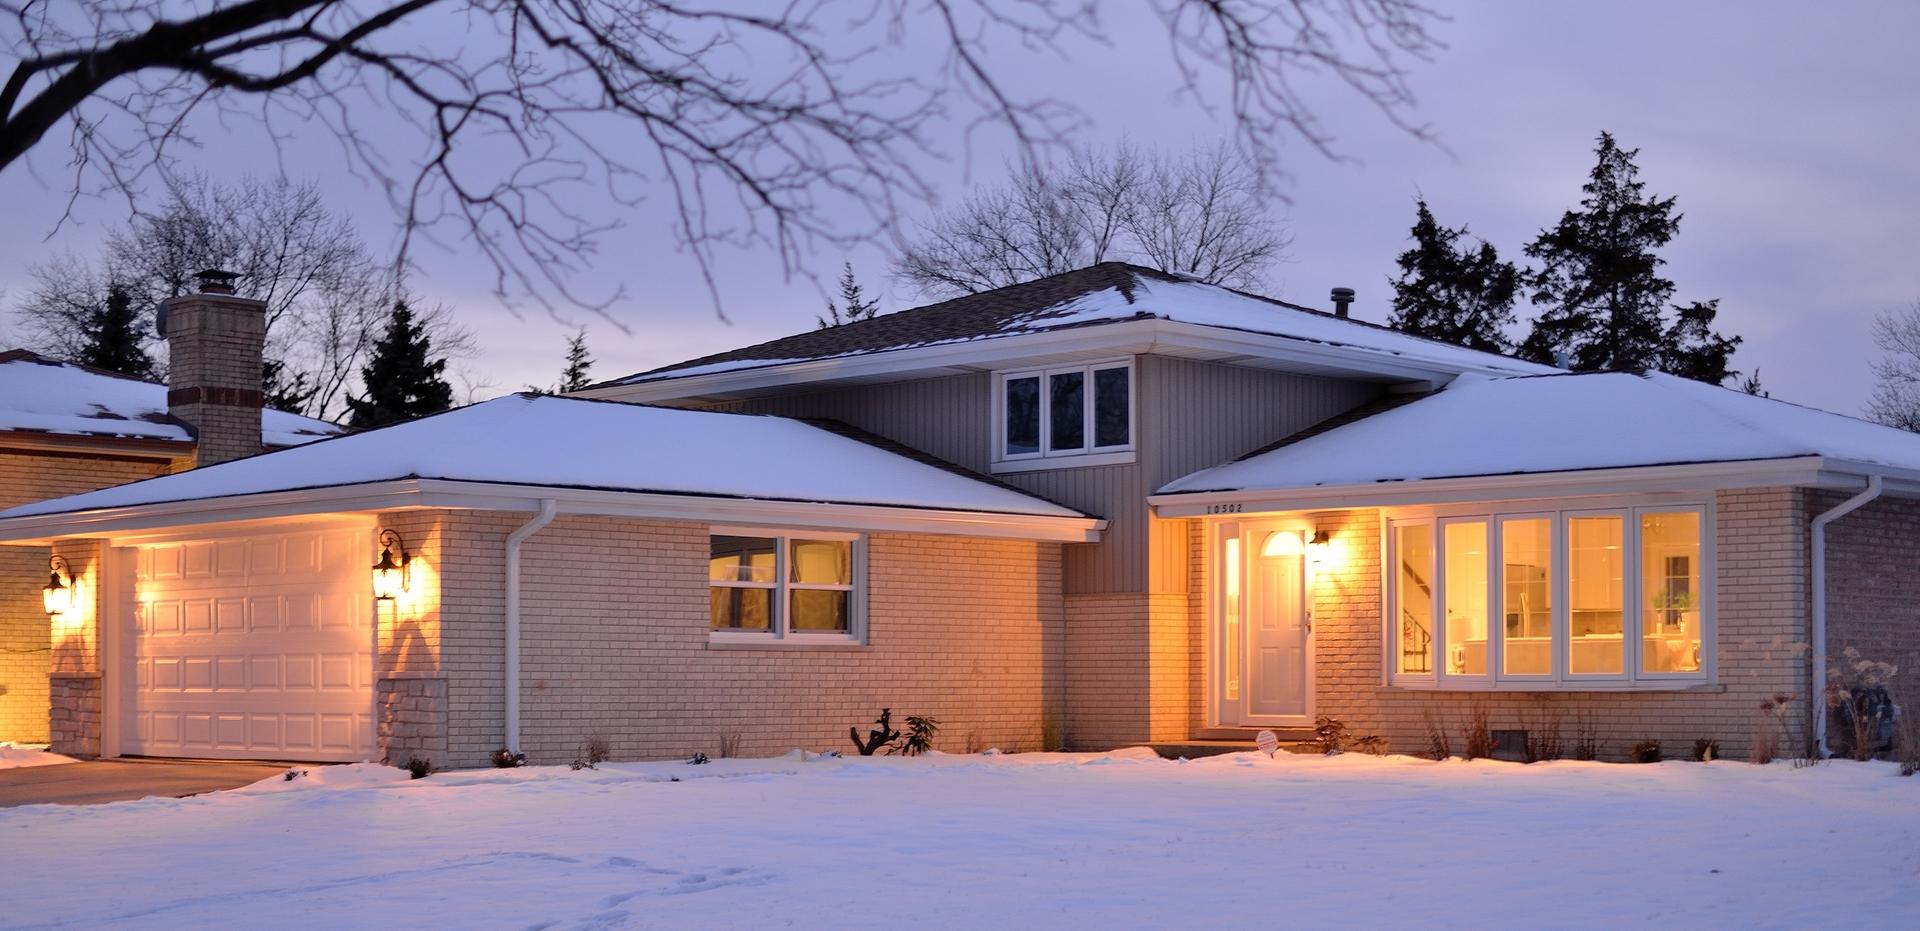 10502 South Vicky Lane, Palos Hills, Illinois